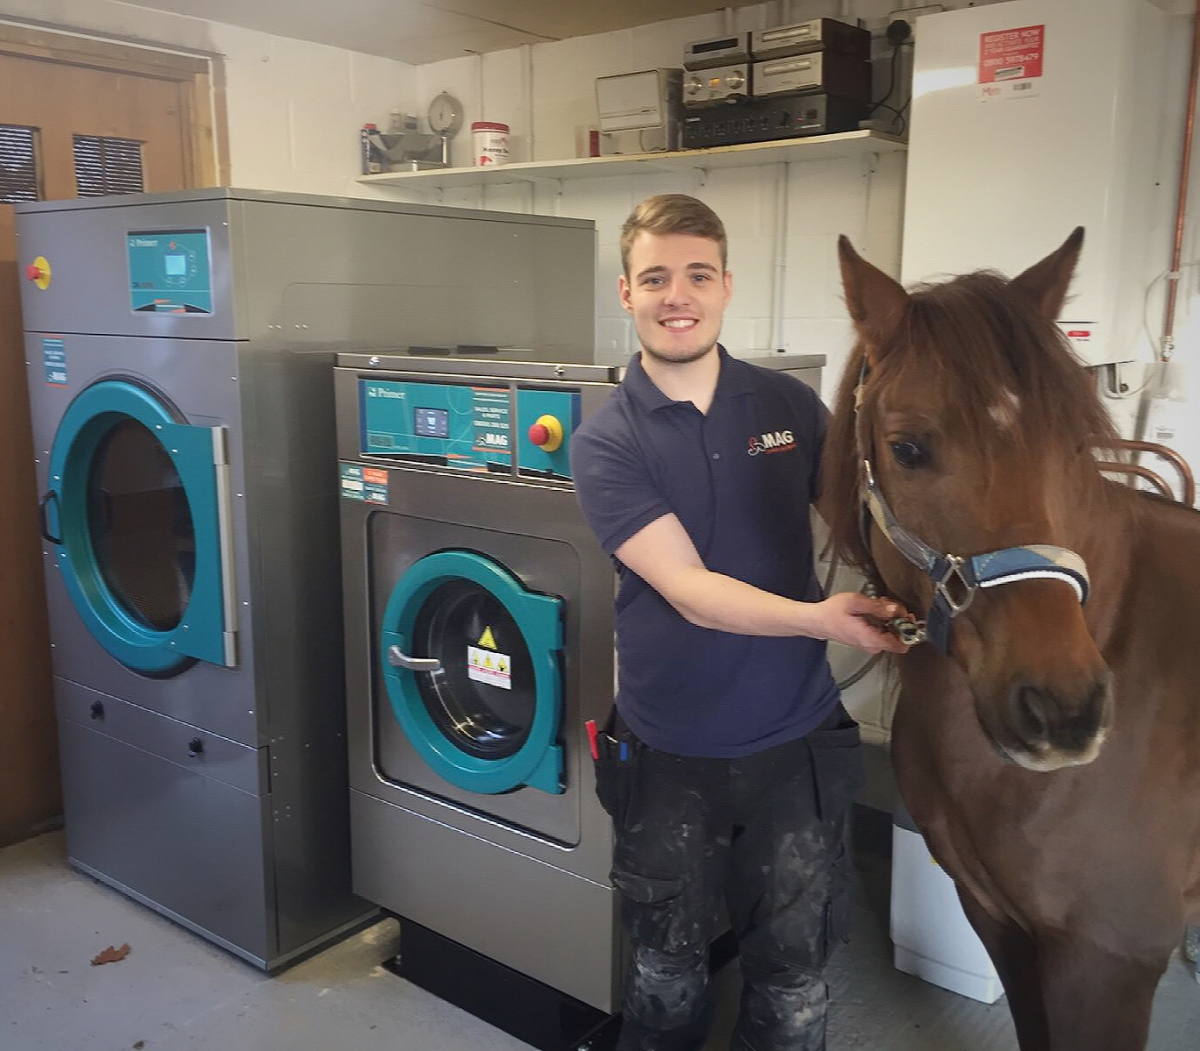 Equestrian laundry equipment